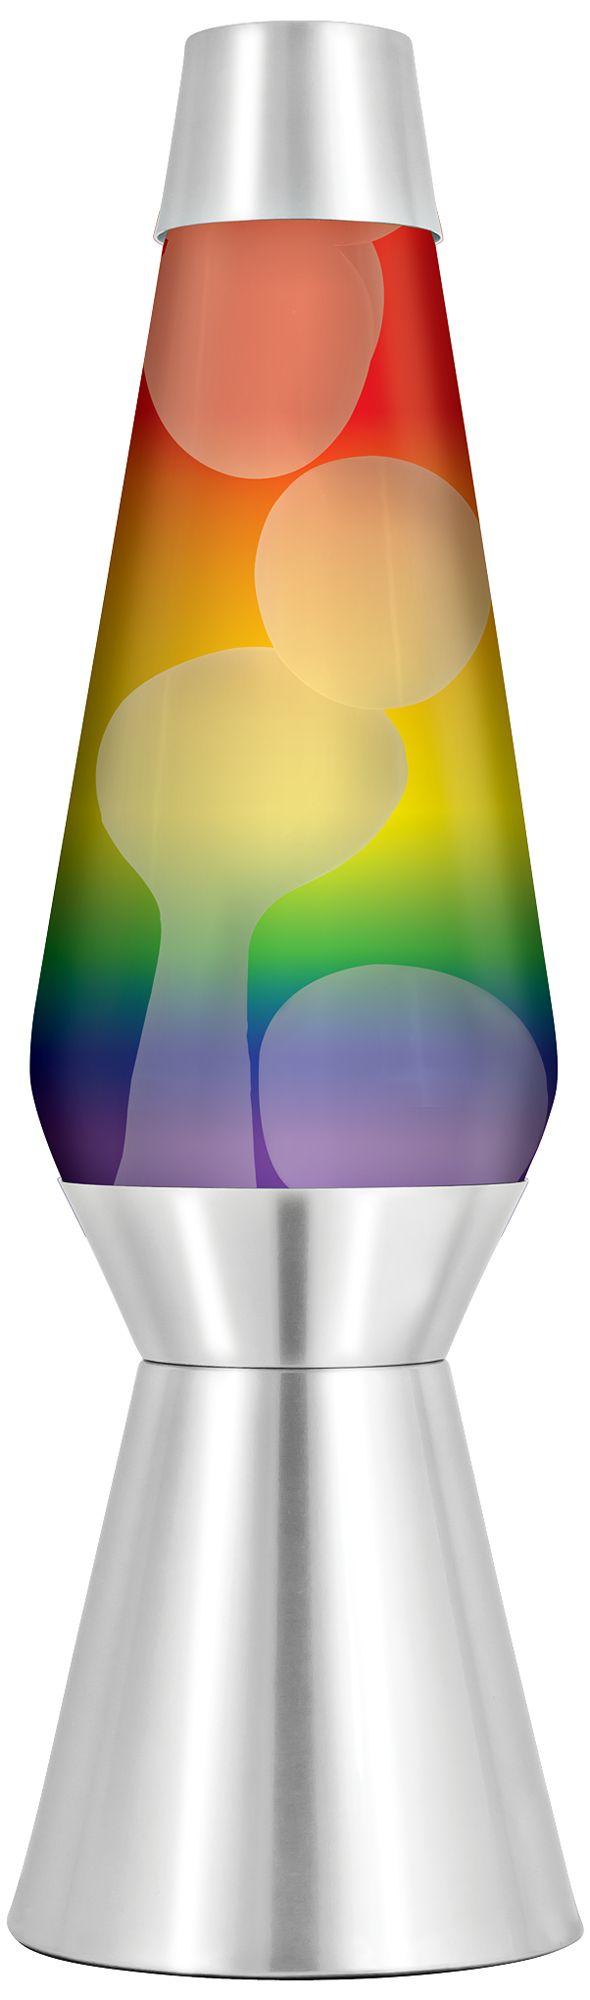 Lava lamp - Wikipedia